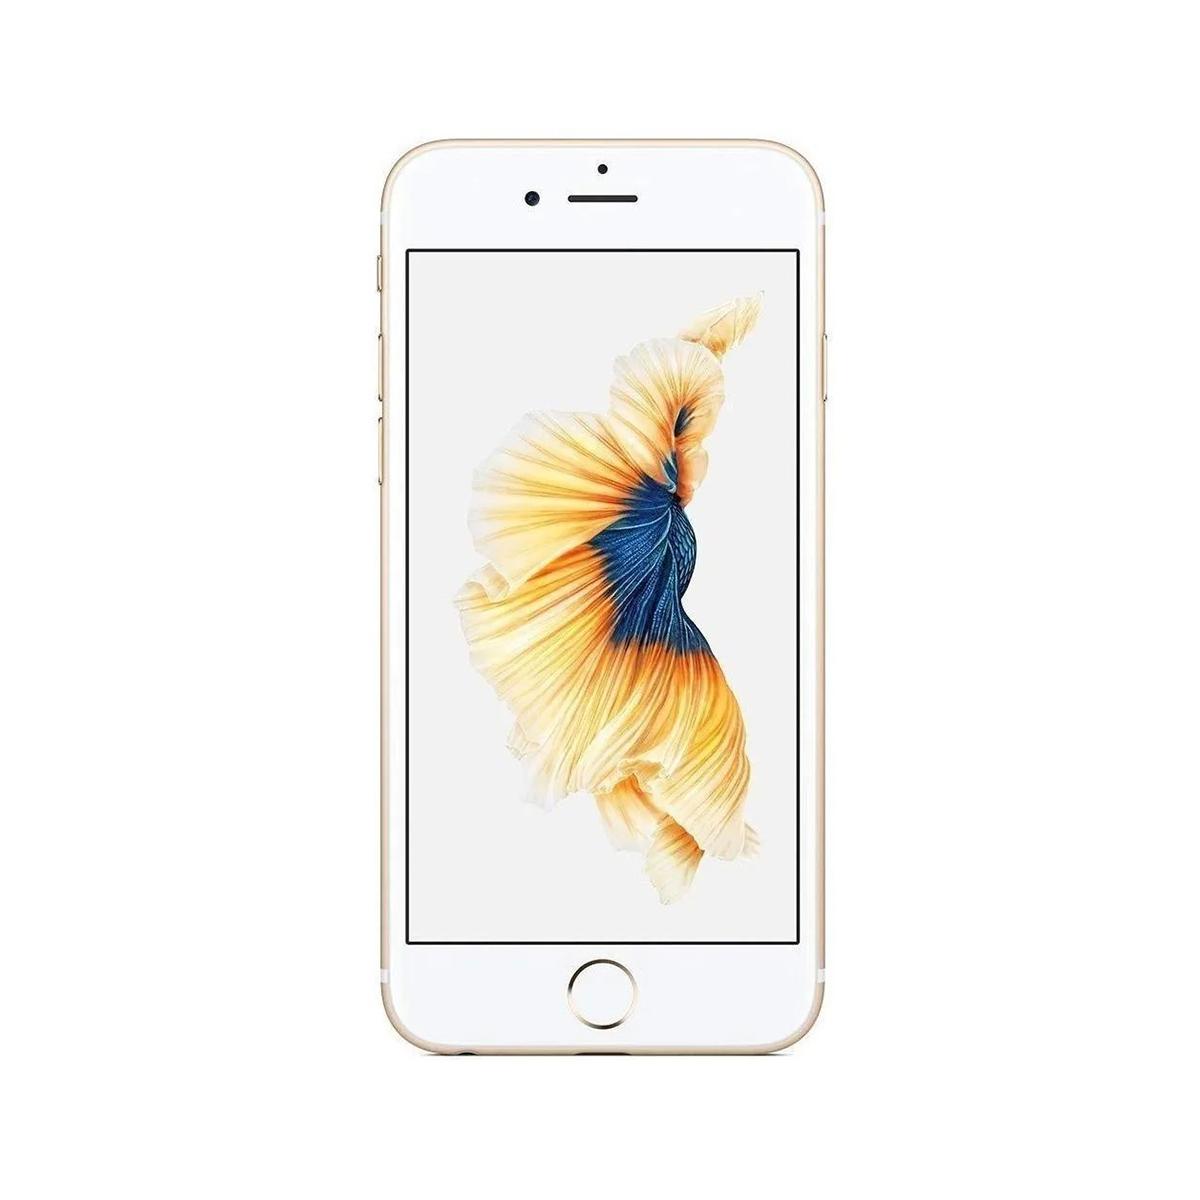 Smartphone Apple iPhone 6s 64GB Tela 4.7' 12MP - Usado